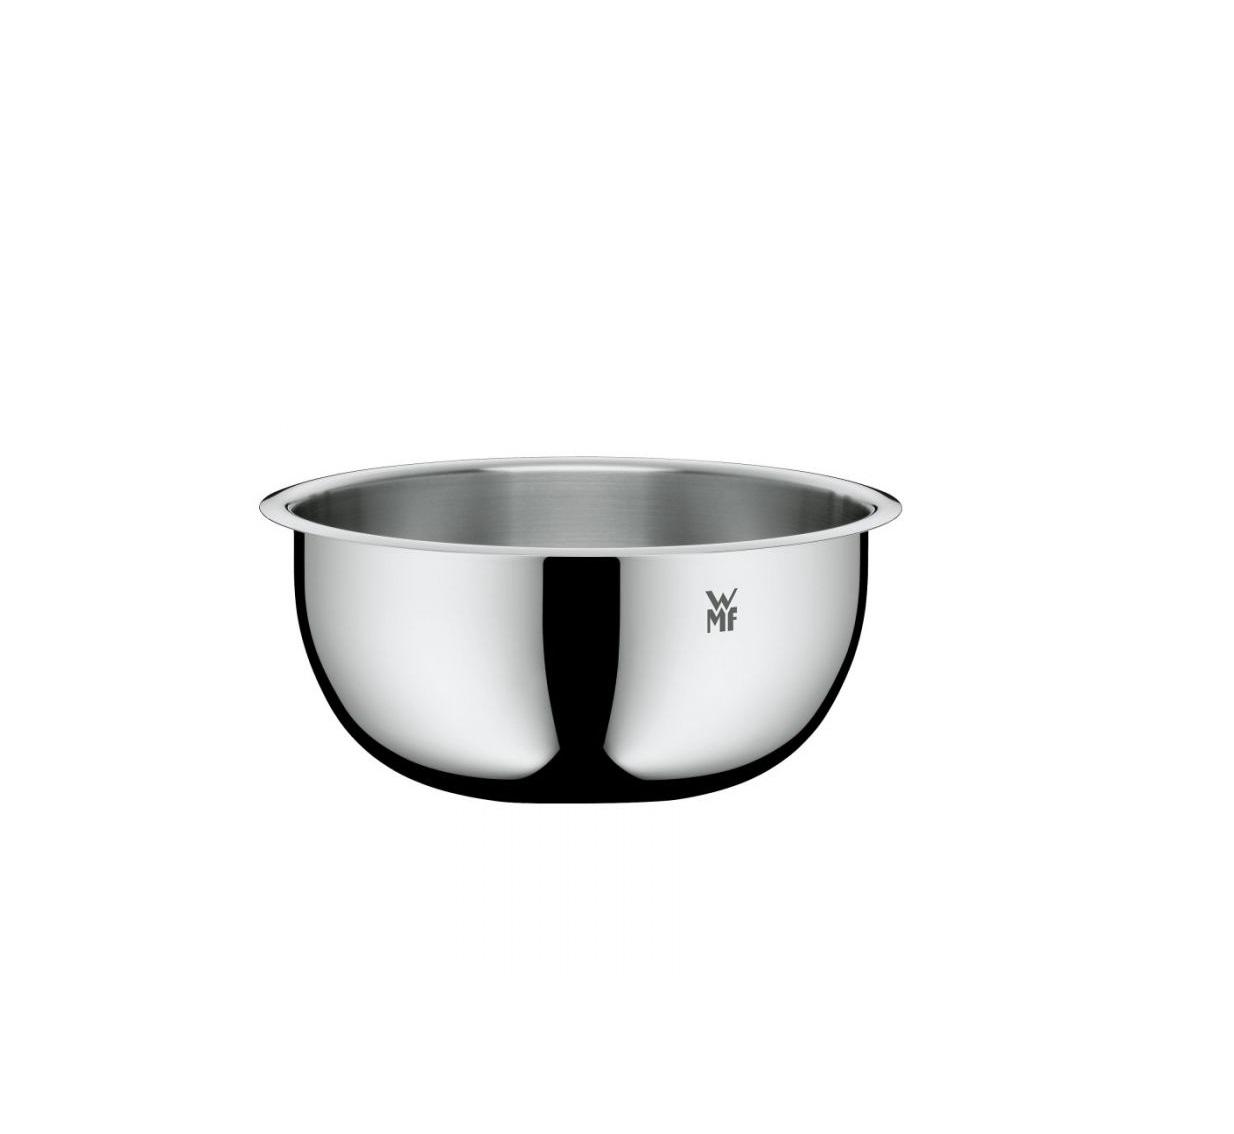 Миска WMF, диаметр 28 см, объем 5,5 л, серебристый WMF 06 4563 6030 фото 1